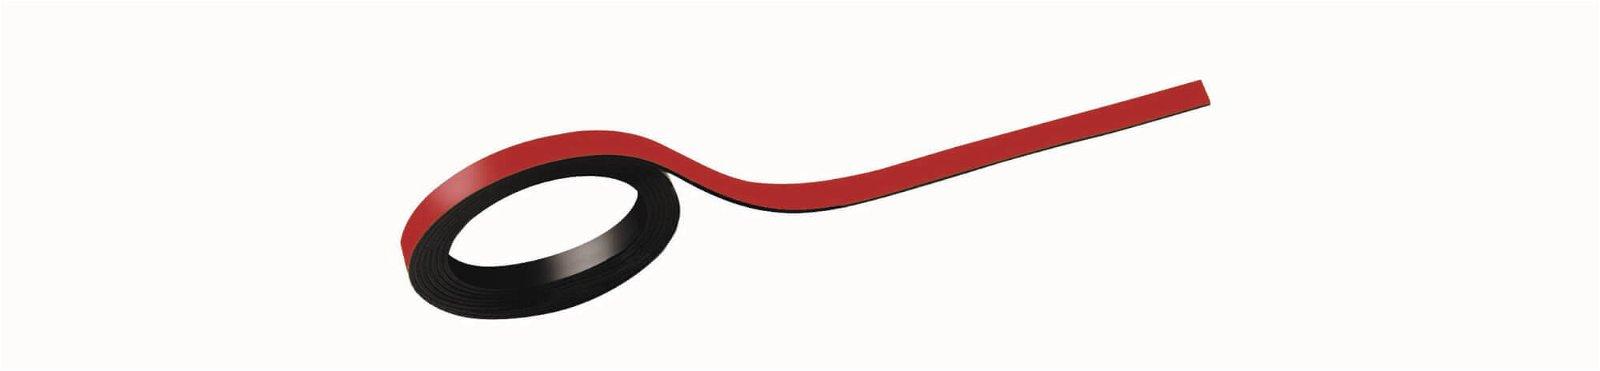 Magnetstreifen, 0,5x100 cm, 2 St./Set, rot